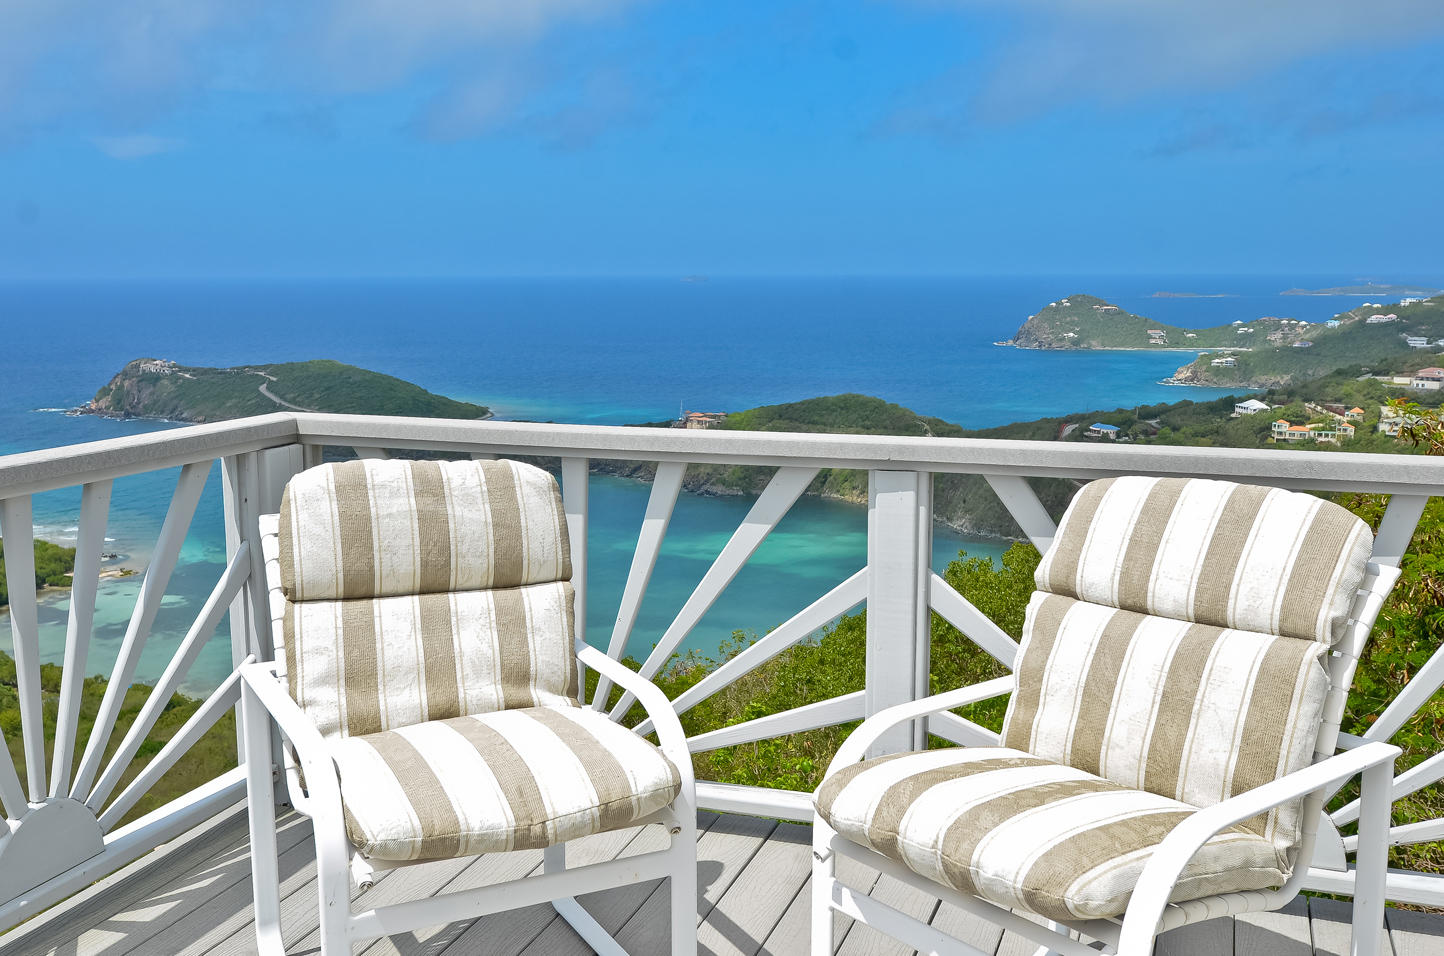 Cabana Upper Porch